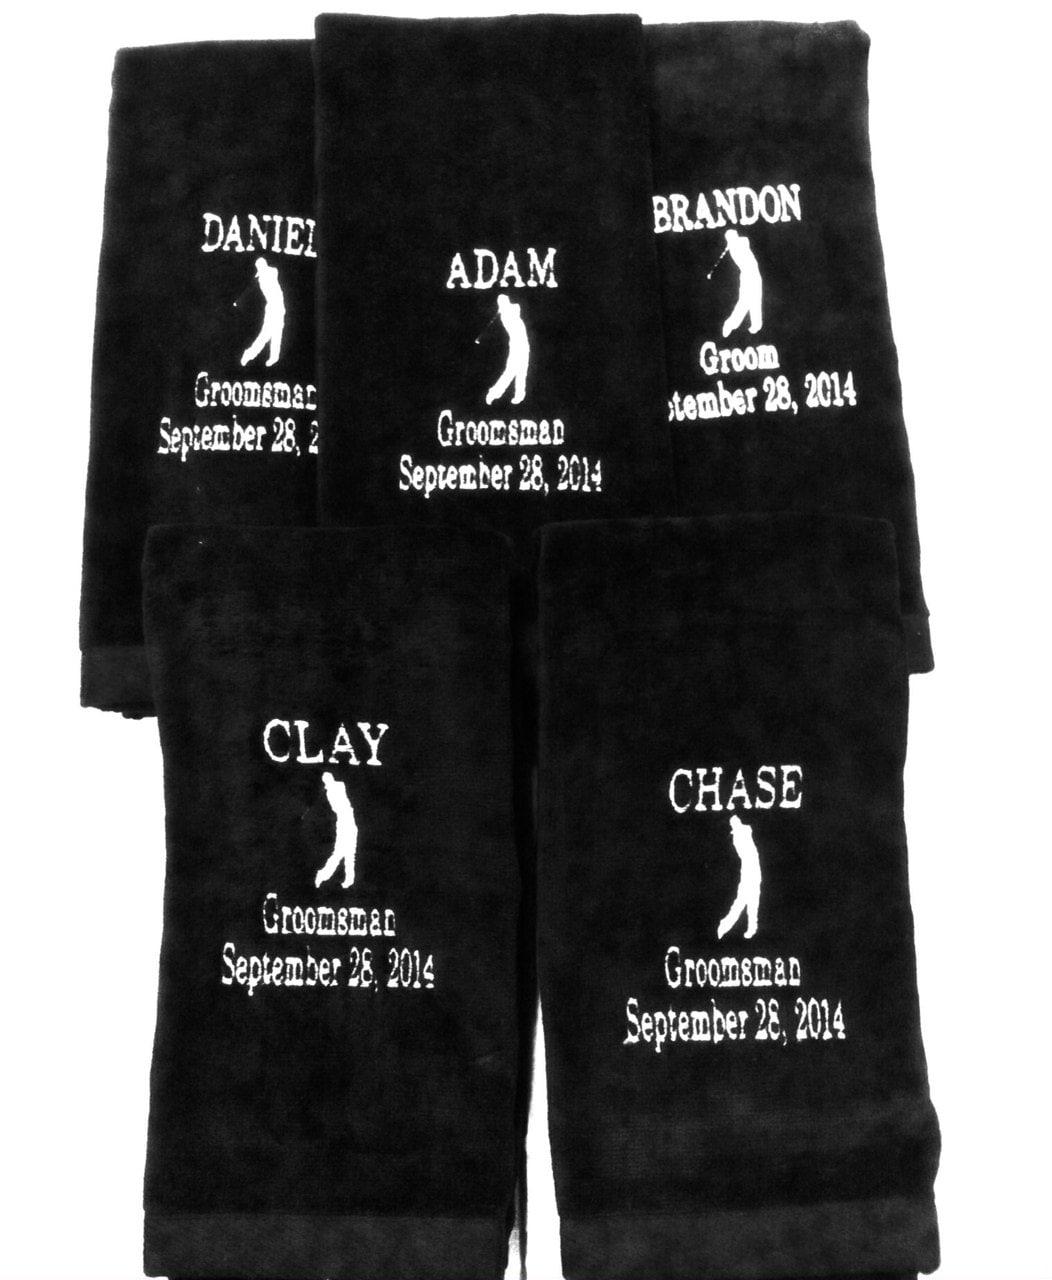 1 Personalized Embroidered Golf Towel Best Man Groosmen Groom